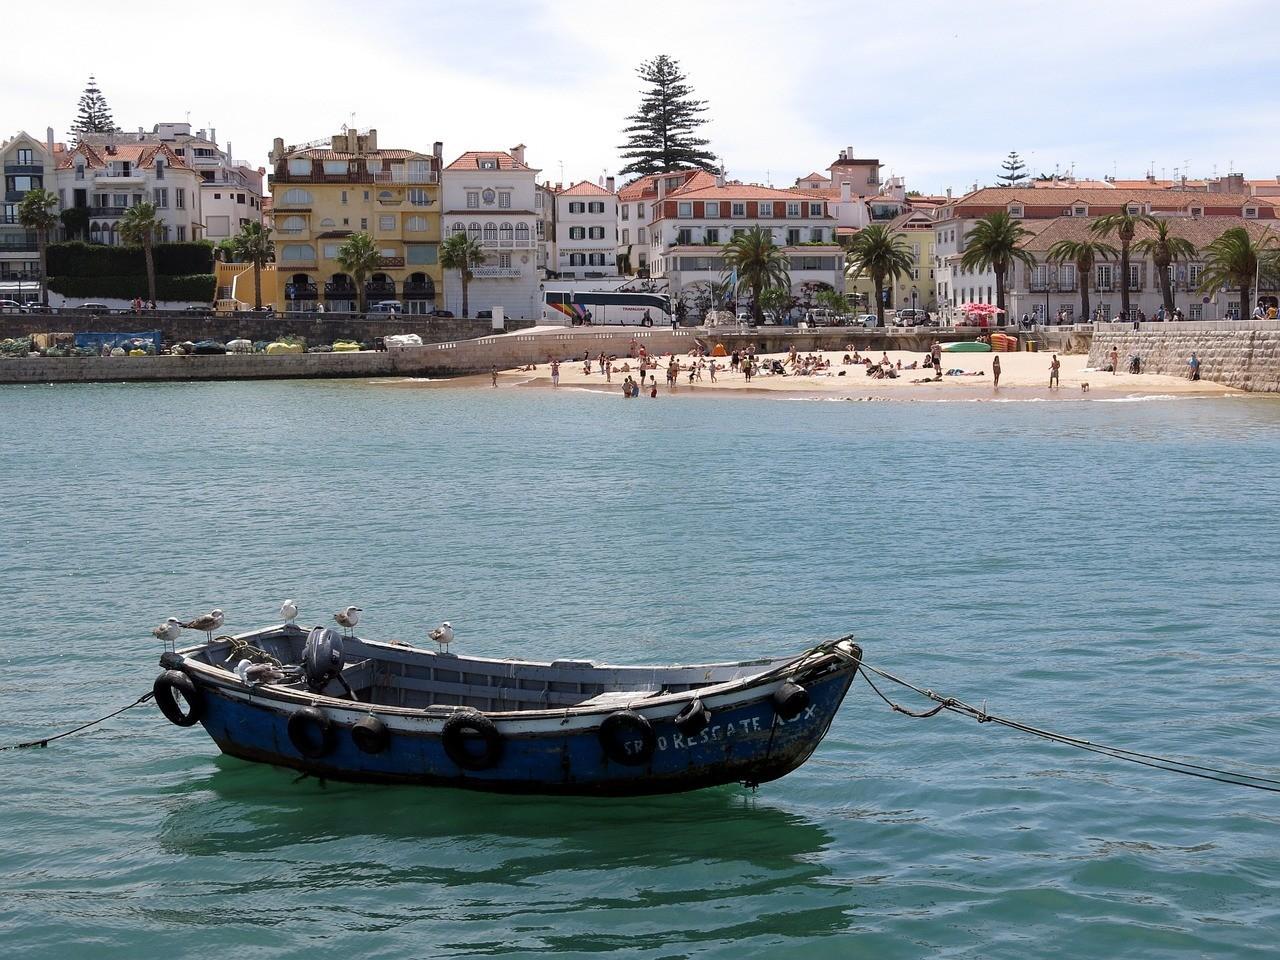 boat-1394554_1280.jpg